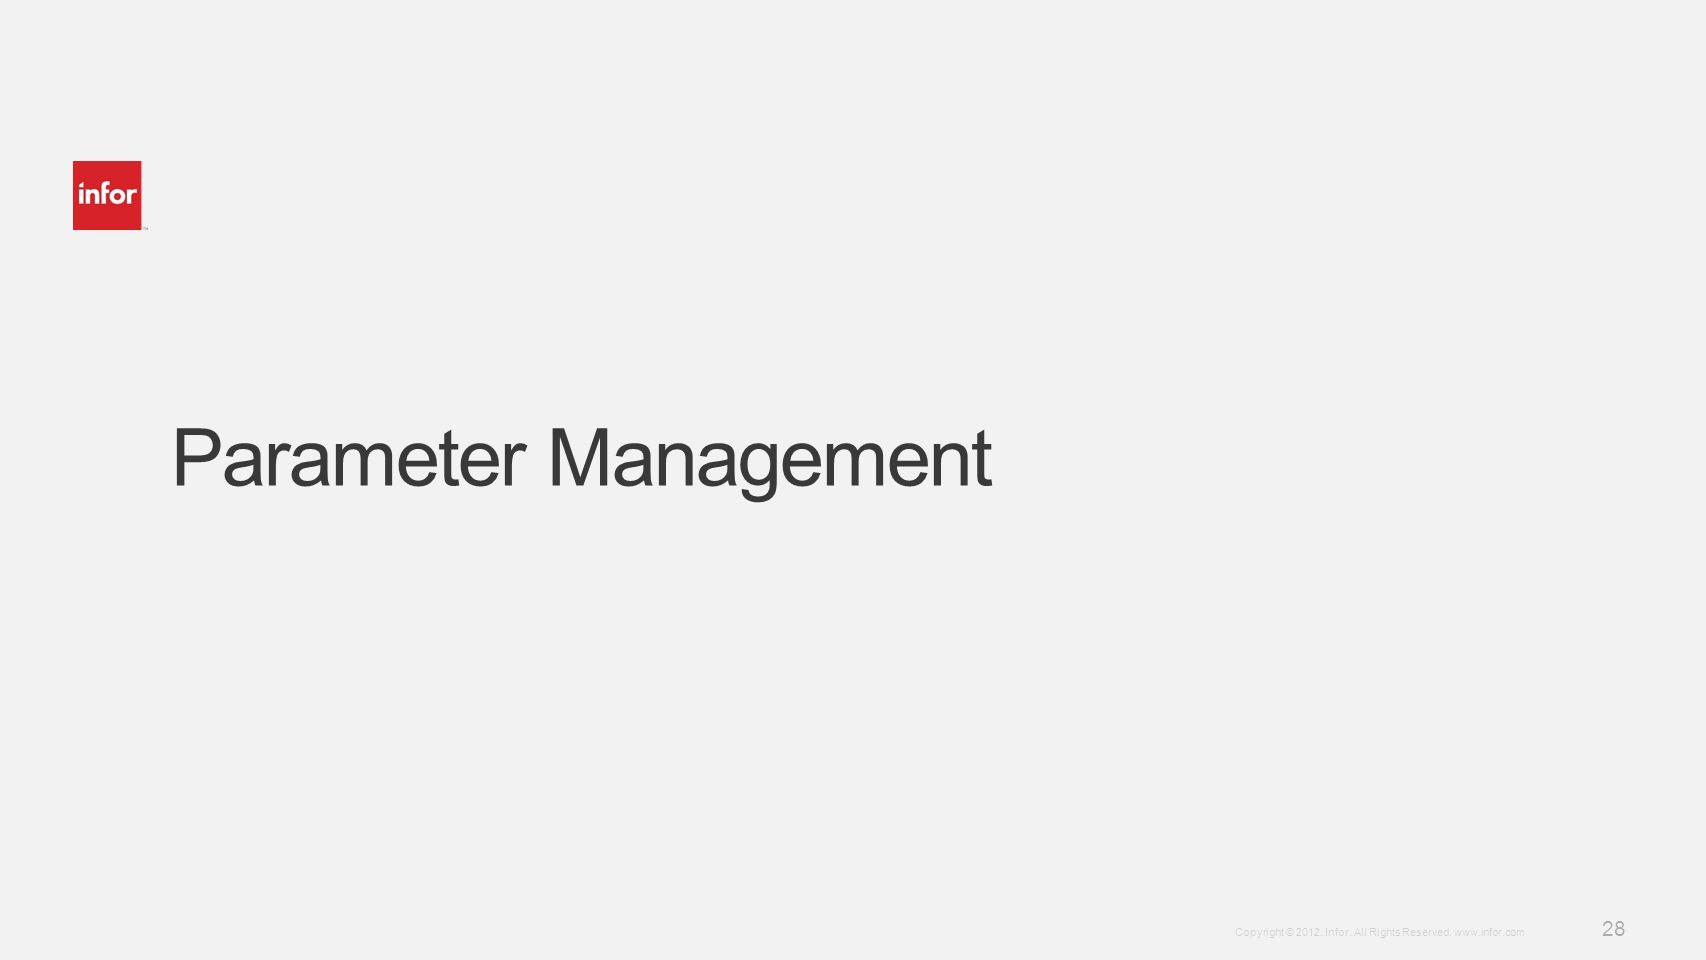 Parameter Management